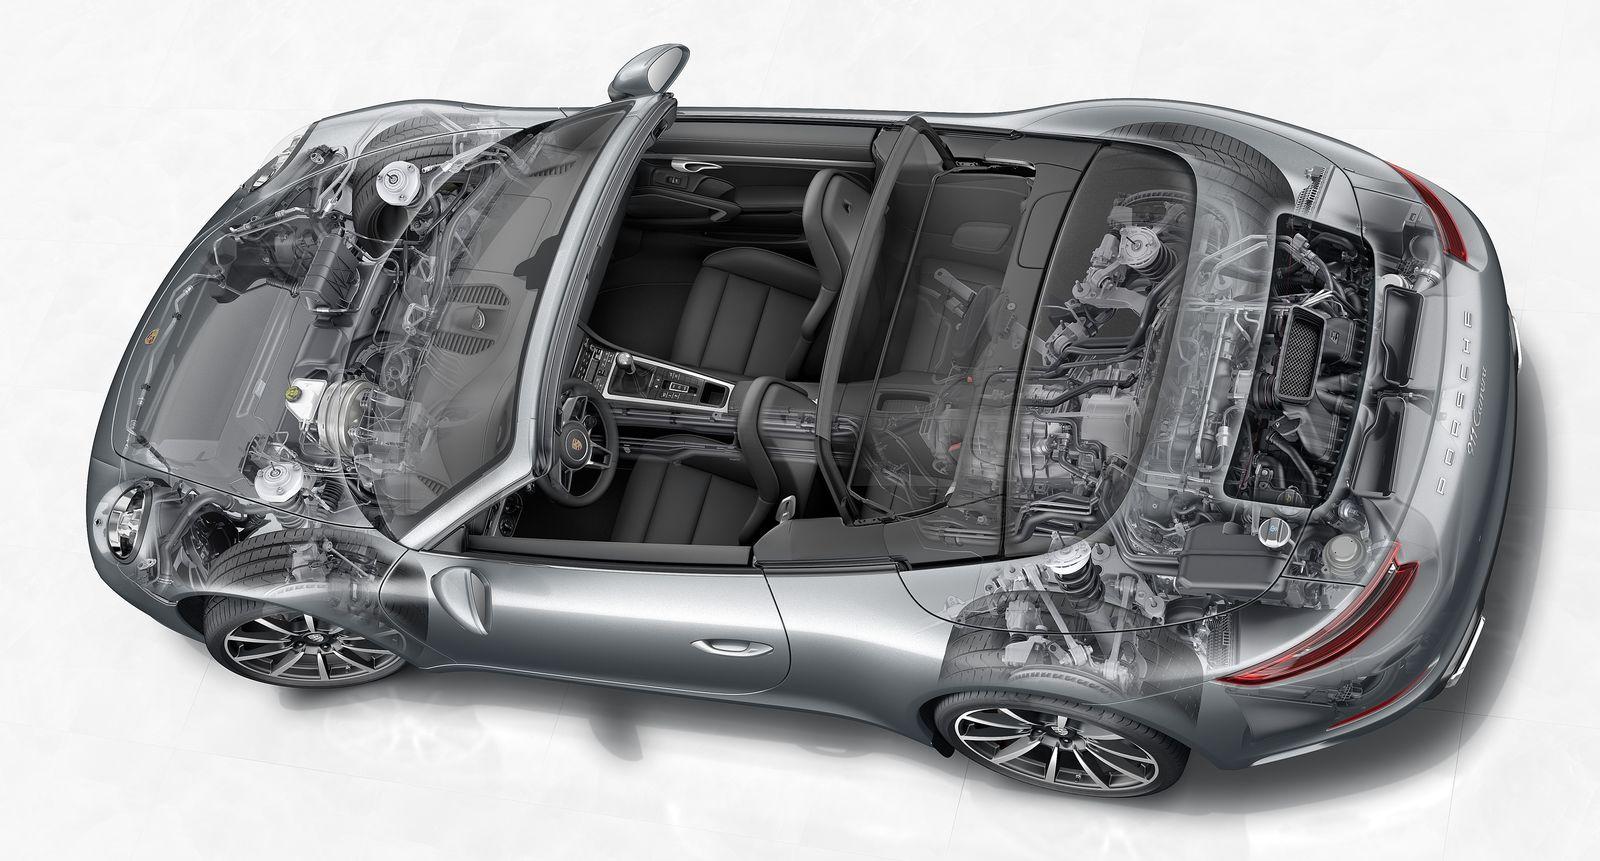 porsche 911 cabriolet sizes dimensions guide carwow. Black Bedroom Furniture Sets. Home Design Ideas